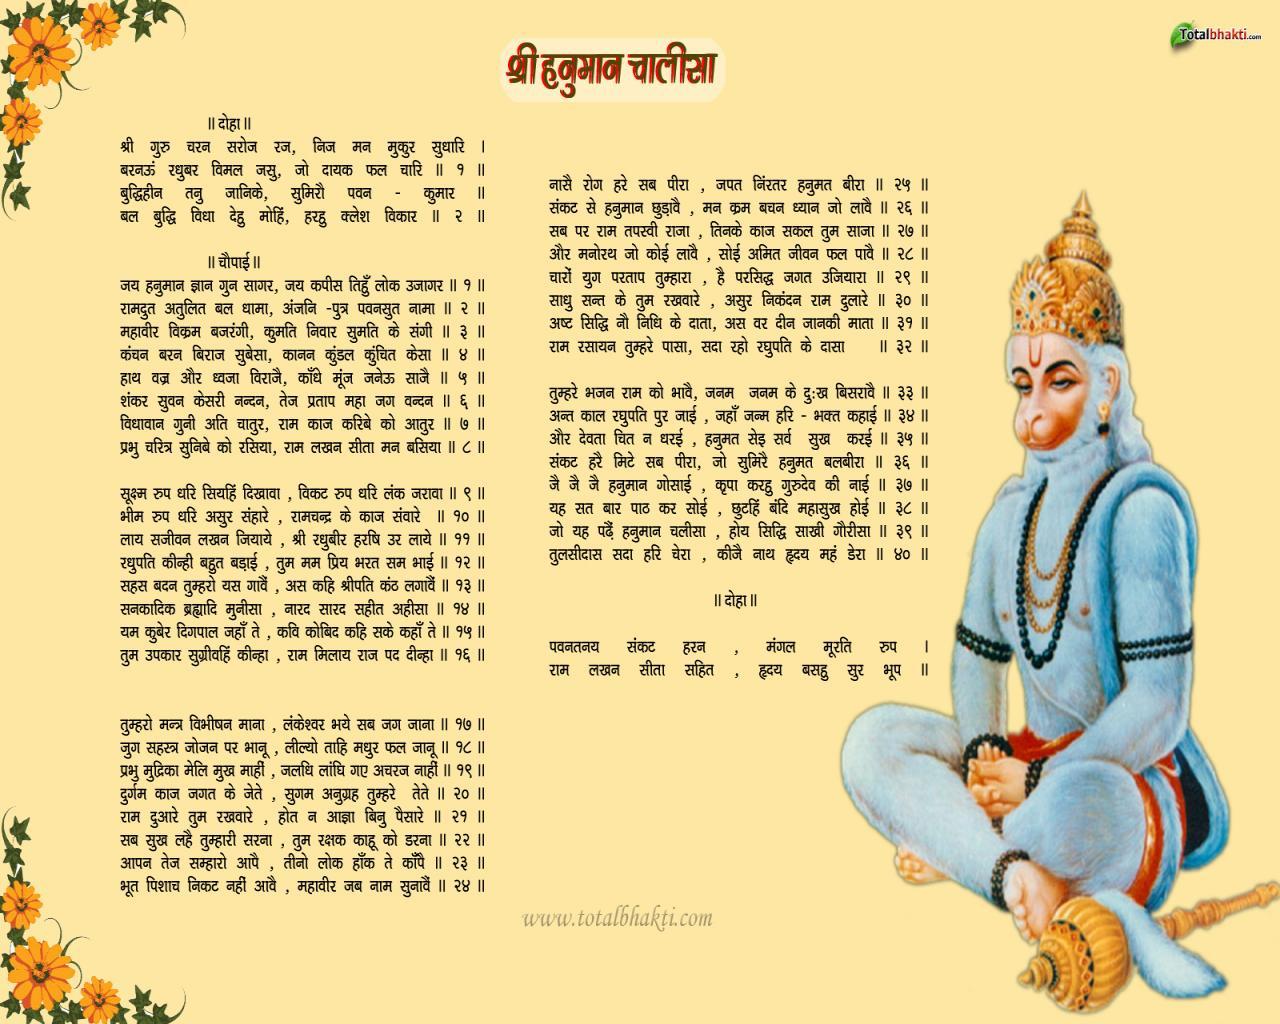 http://2.bp.blogspot.com/-kX_TxXTwfo0/TiRDgdhz_yI/AAAAAAAAAII/kW96rbXPgDw/s1600/Hanuman-Chalisa-hindi-wallpaper.jpg